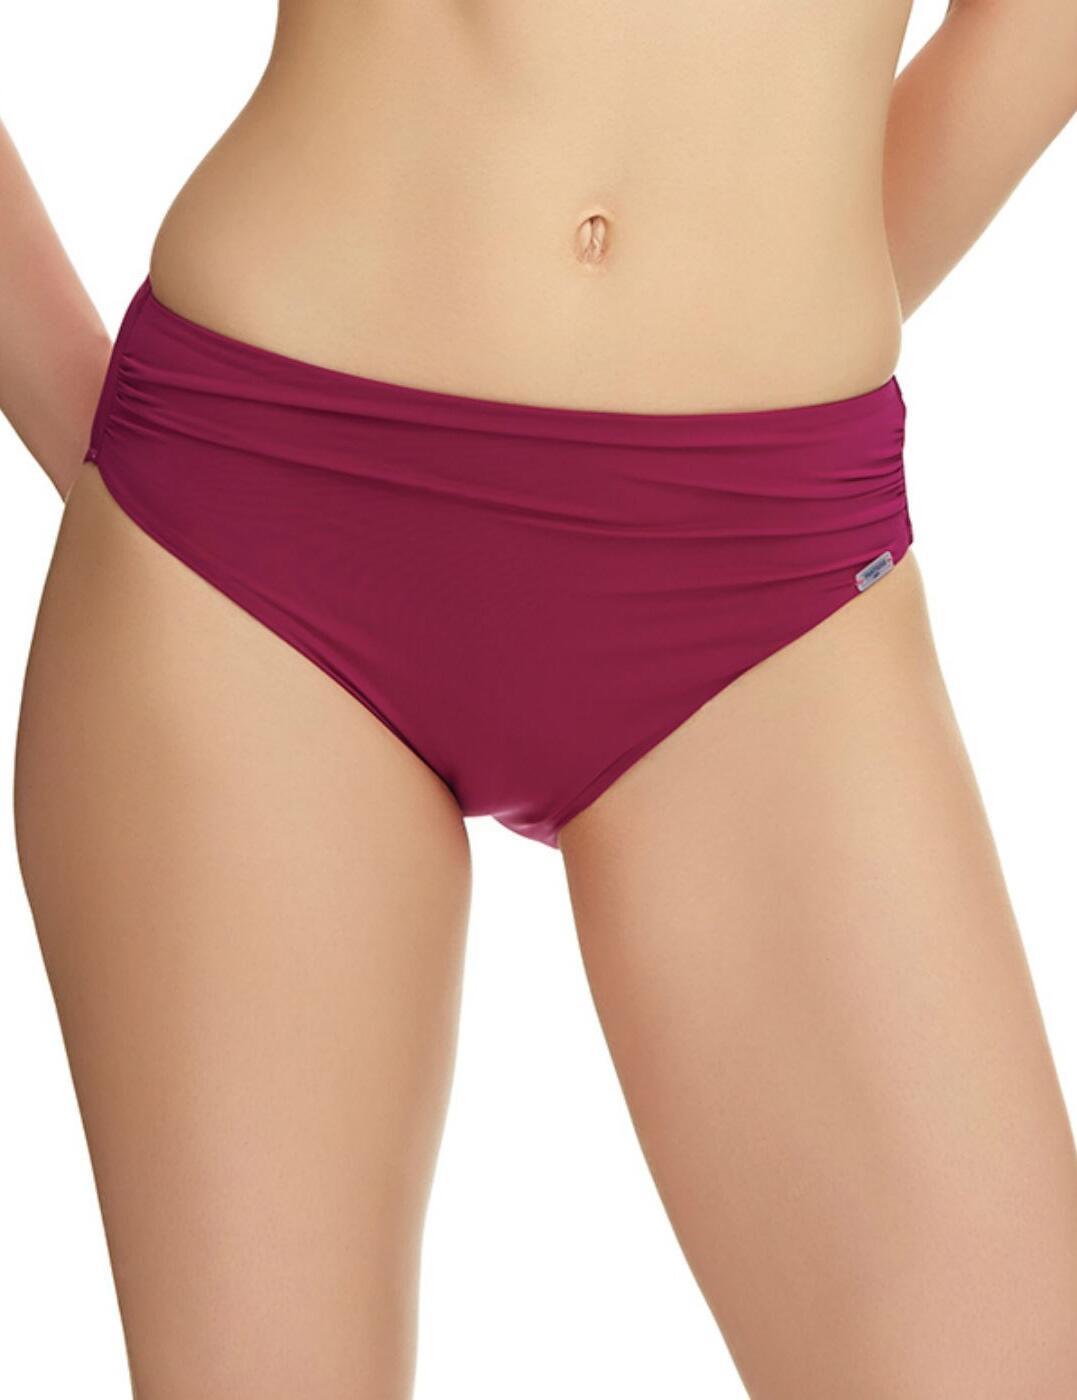 6274 Fantasie Viana Mid Rise Bikini Brief Berry - 6274 Mid Rise Bikini Brief